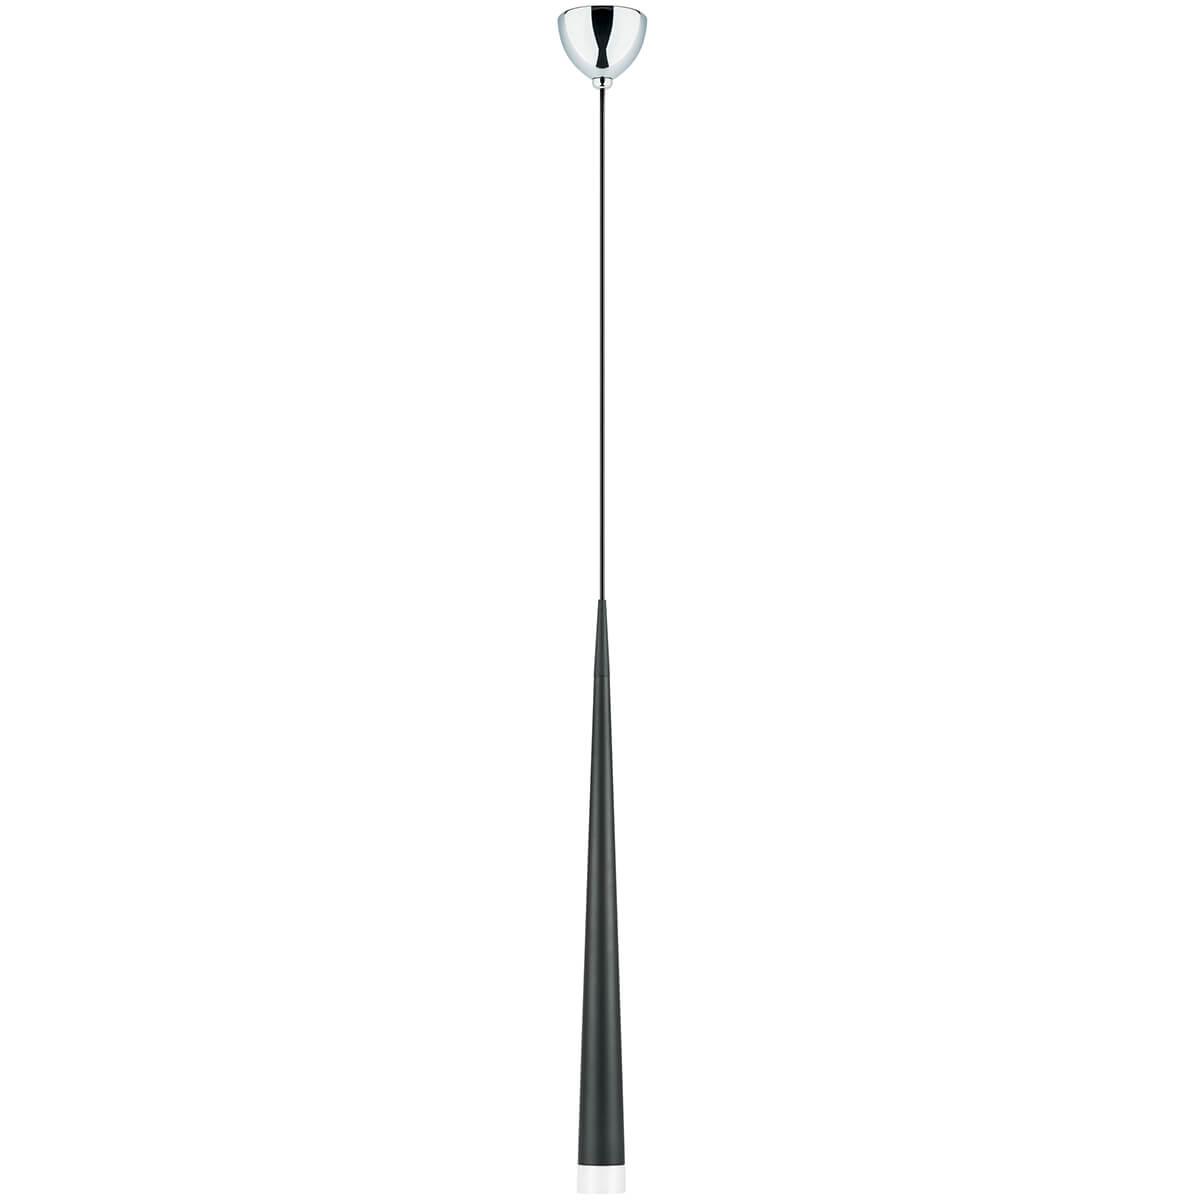 Светильник Lightstar 807017 Meta Duovo недорого